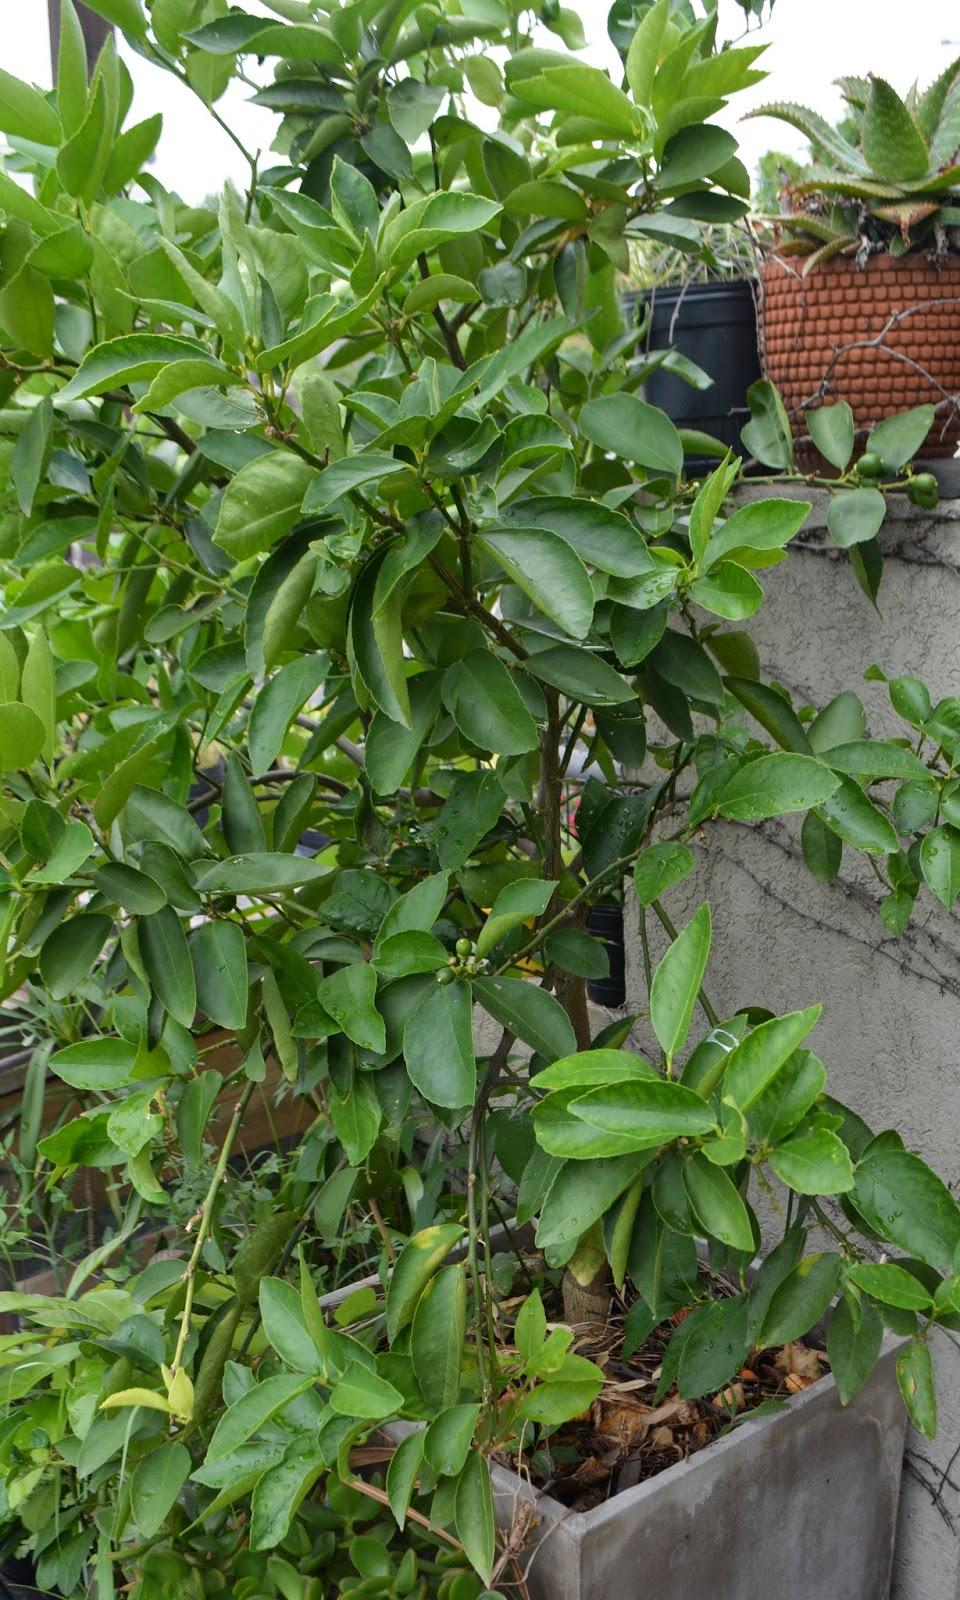 Lim n caipirinha rboles frutales c tricos citrus for Cultivo de arboles frutales en macetas